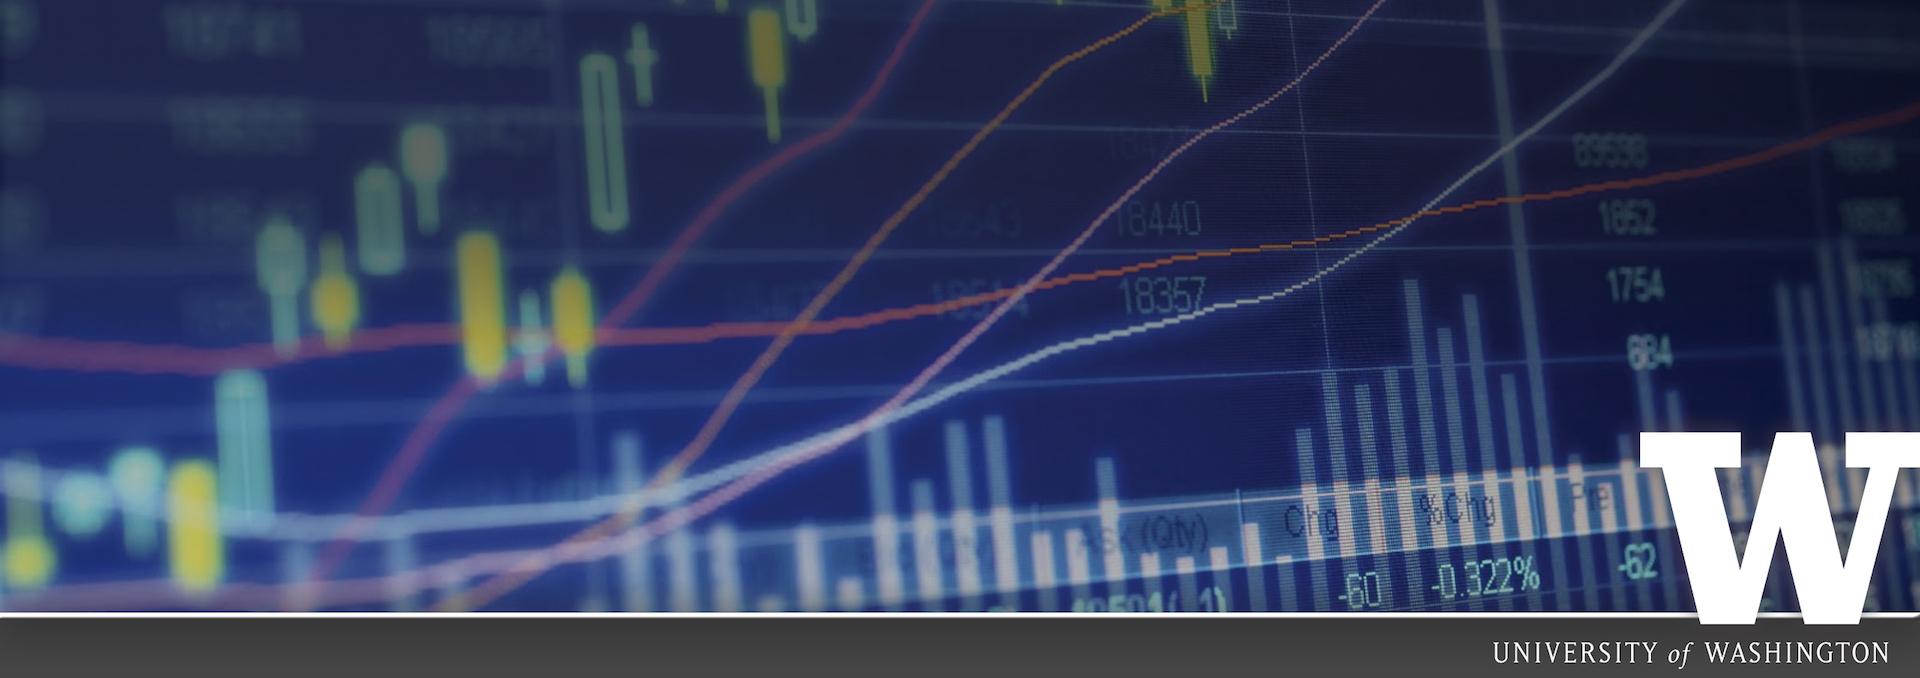 Uw computational finance risk management xflitez Gallery